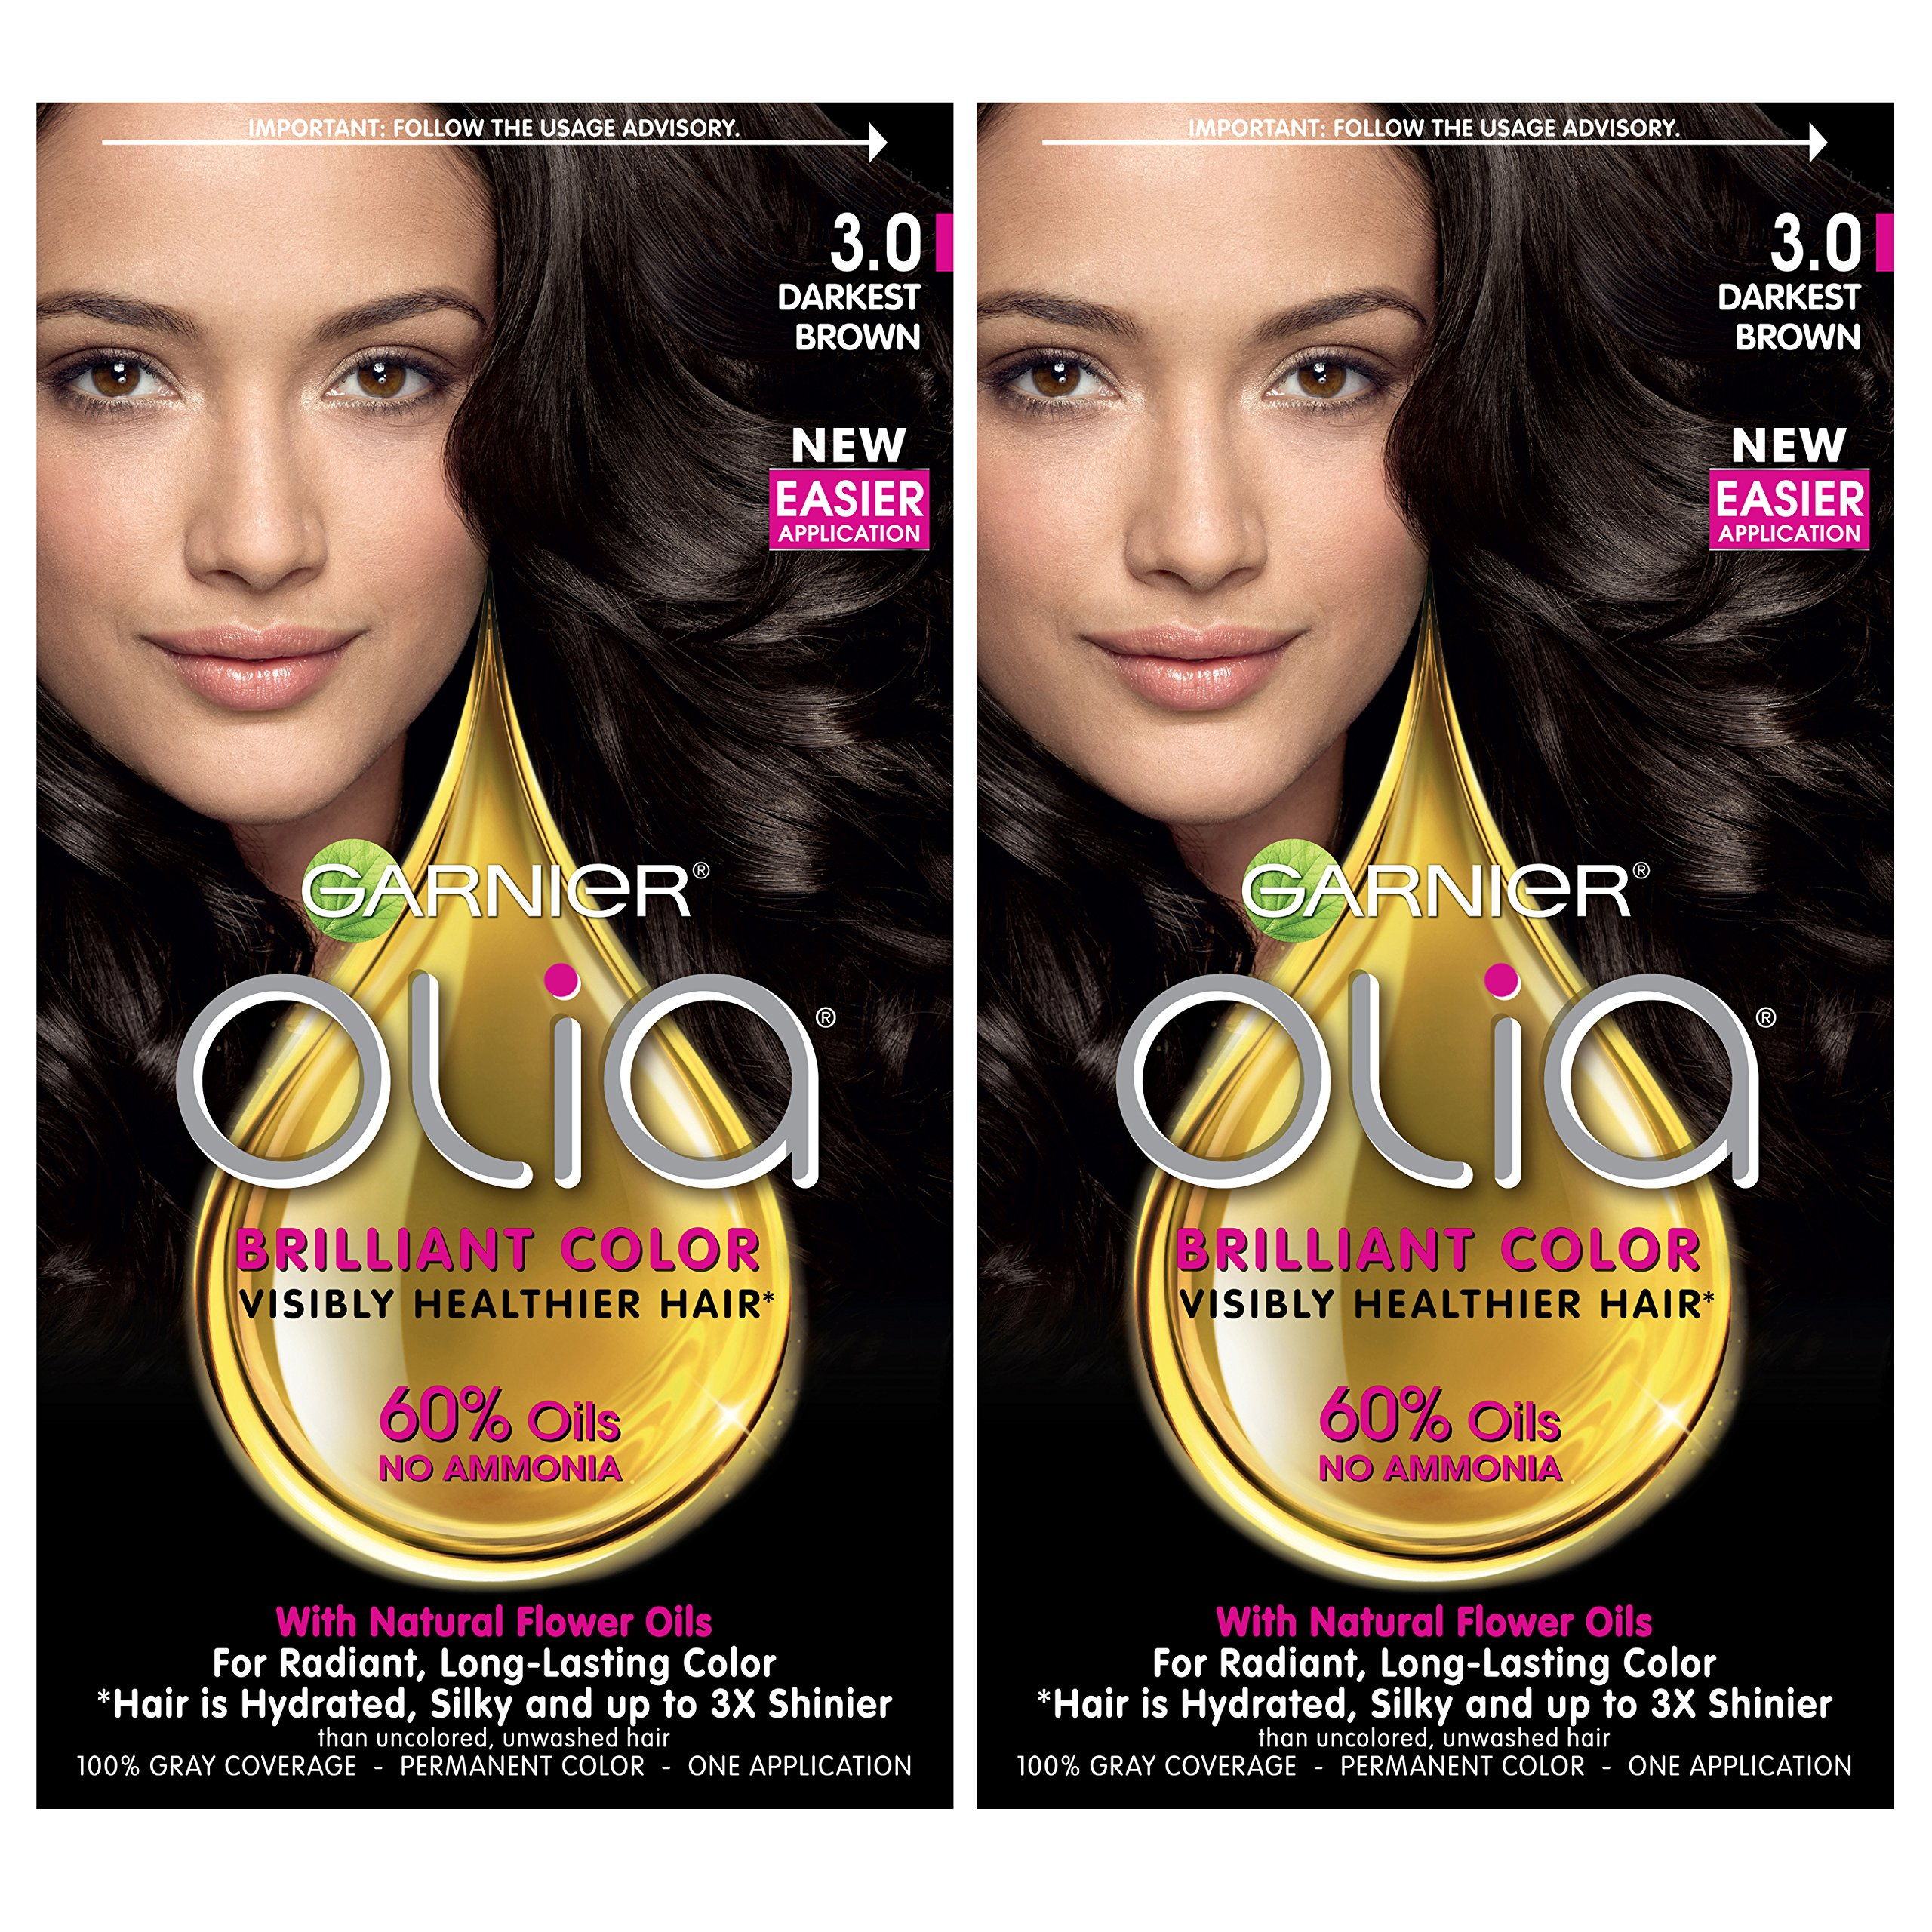 Amazon.com: Garnier Olia AmoniaFree Brilliant Color OilRich Permanent Hair Color, 4.0 Dark